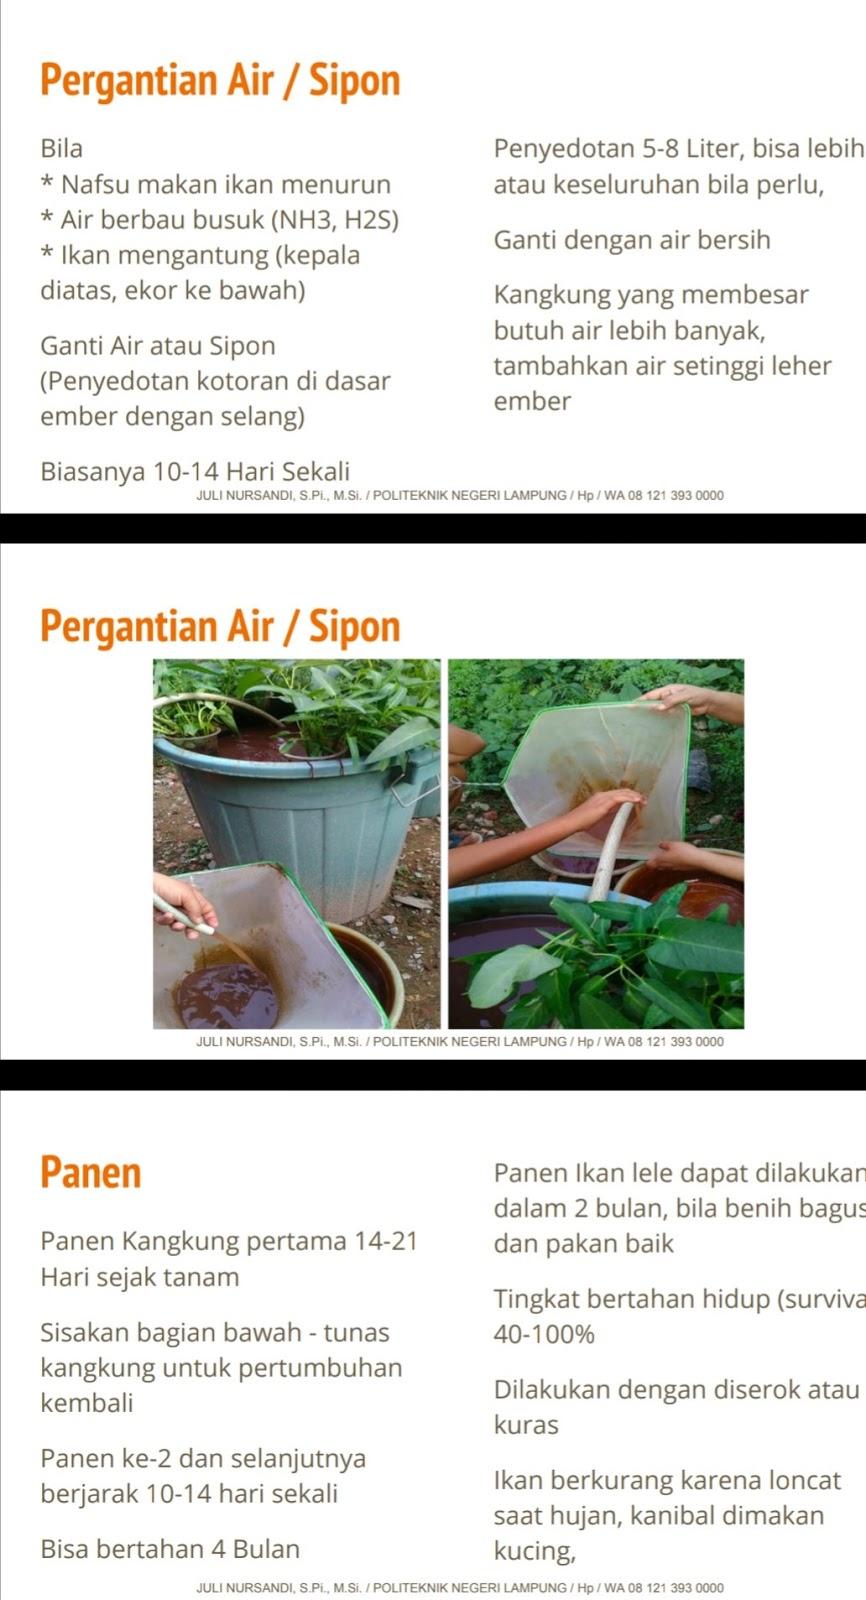 Budidaya Ikan Lele Dan Kangkung Dalam Ember - Cirumanja.com